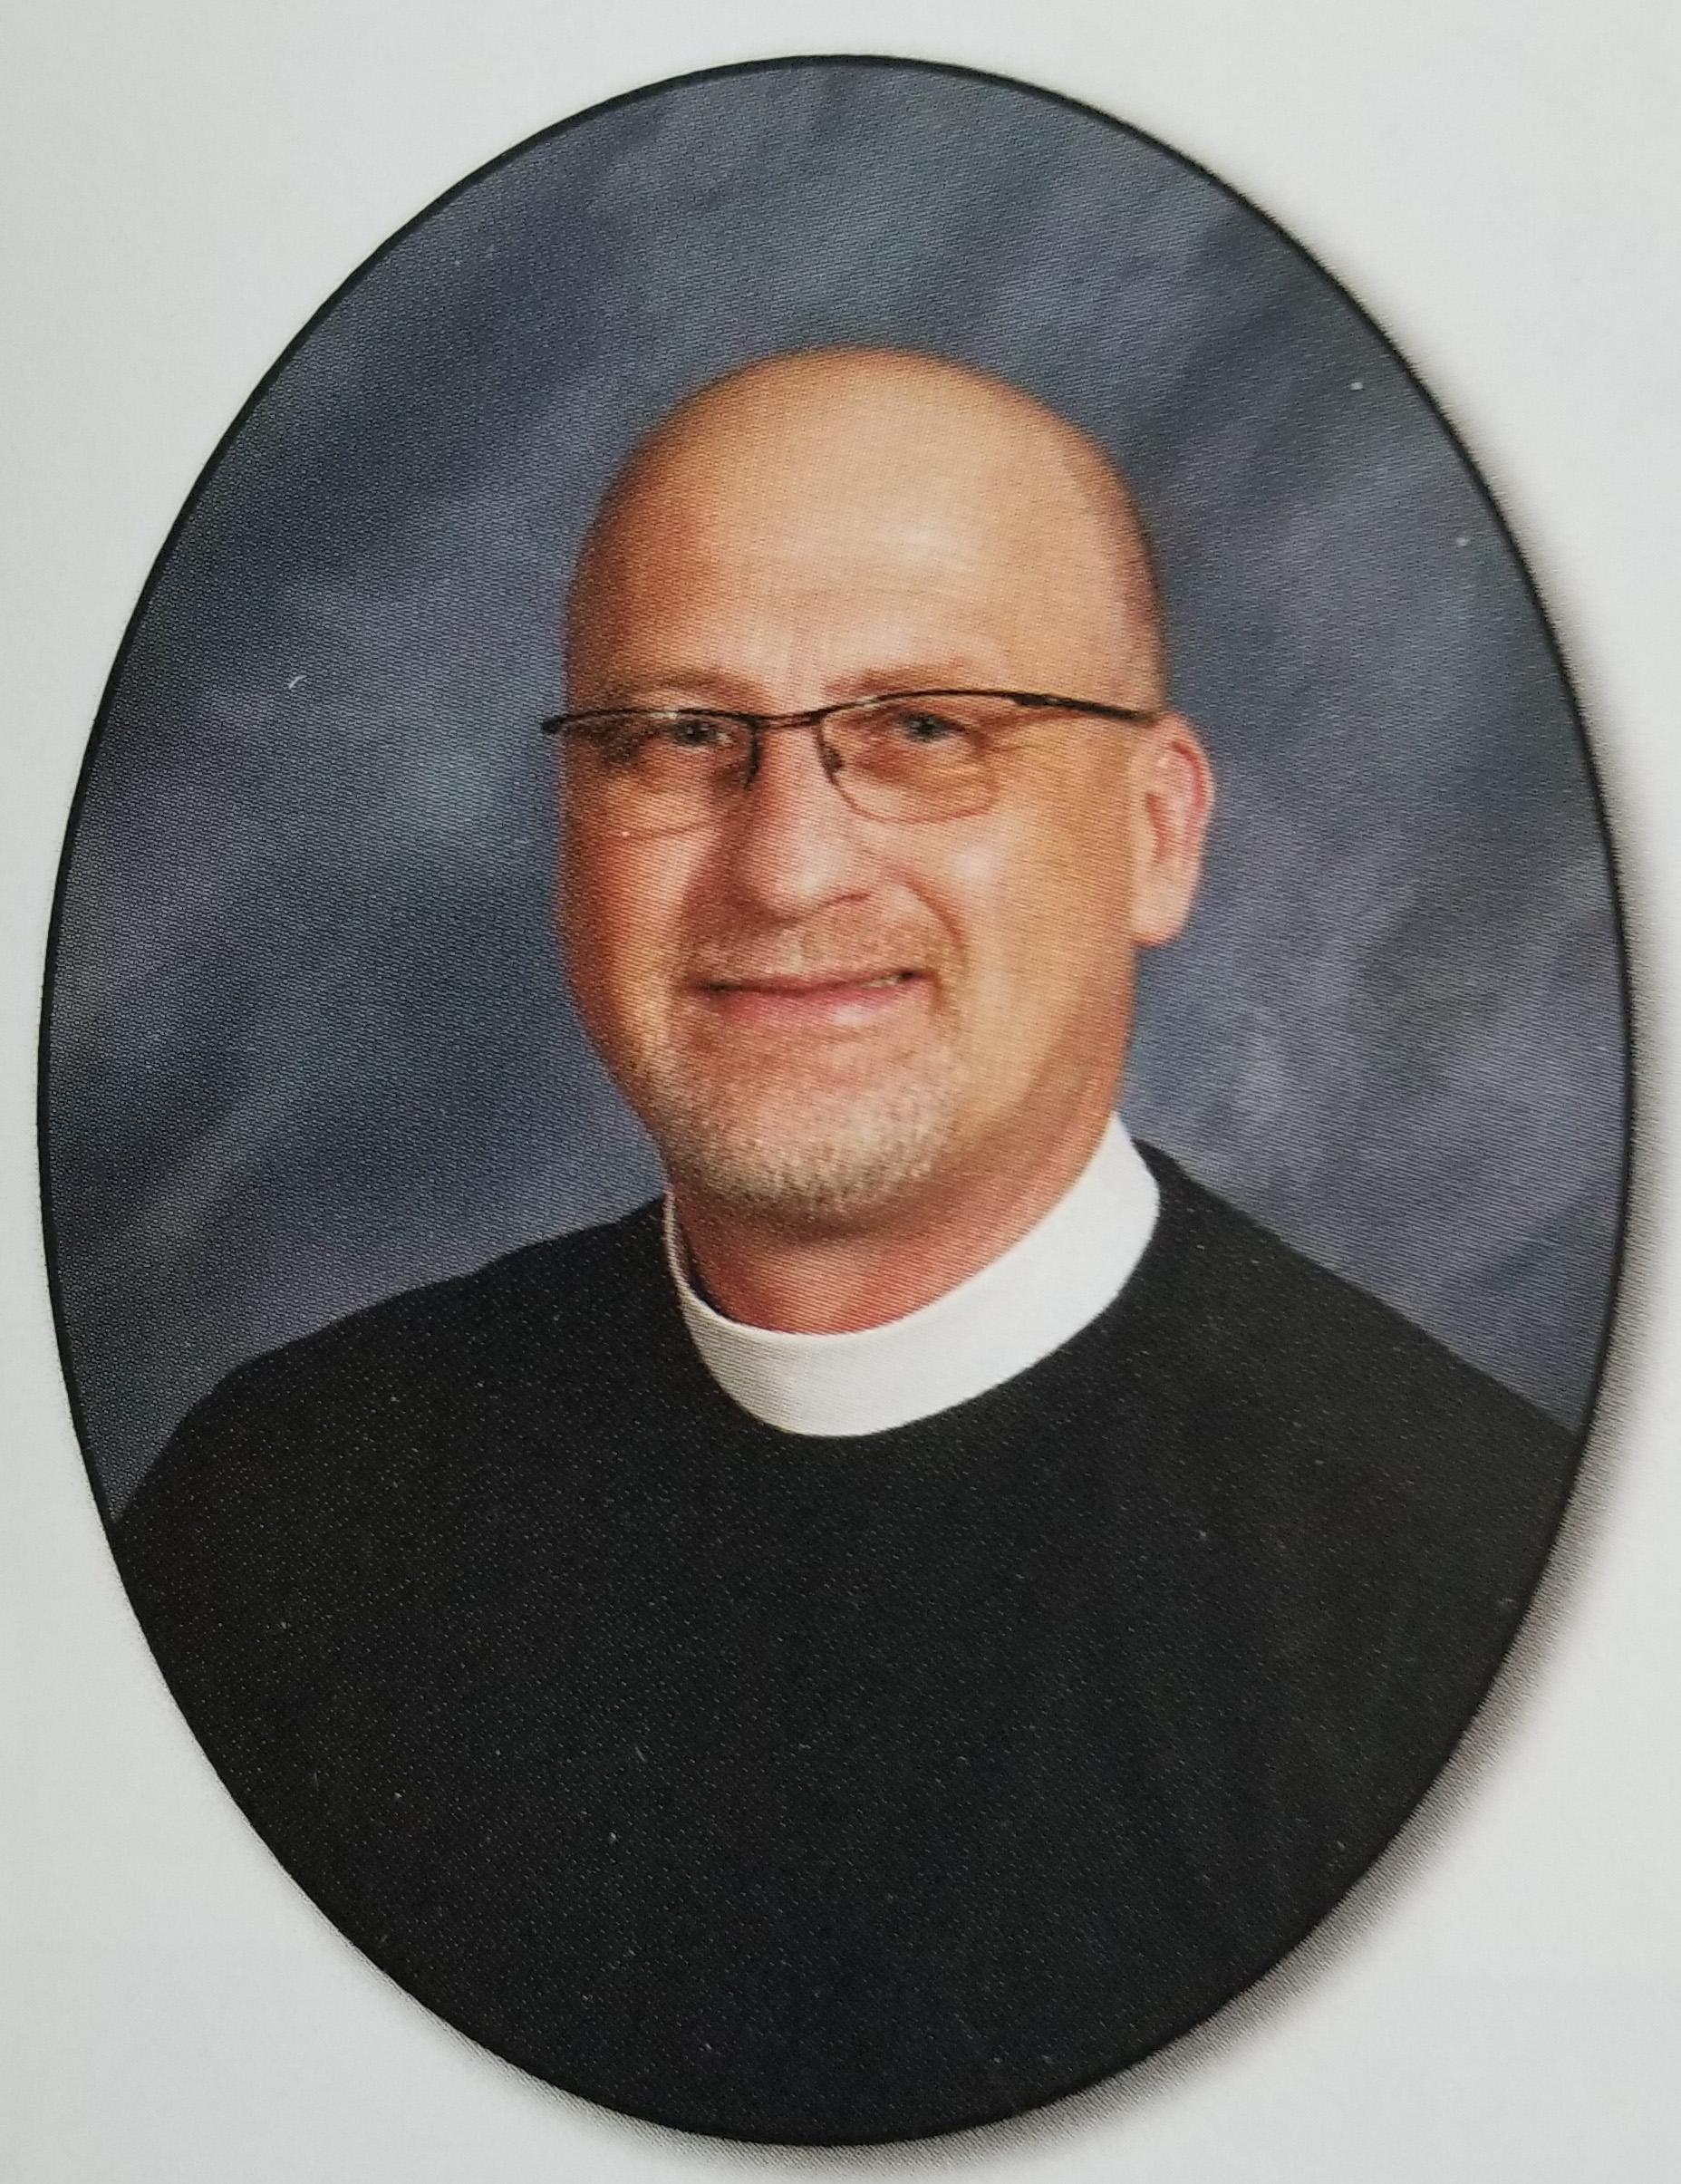 Rev. Thomas L. Schacher